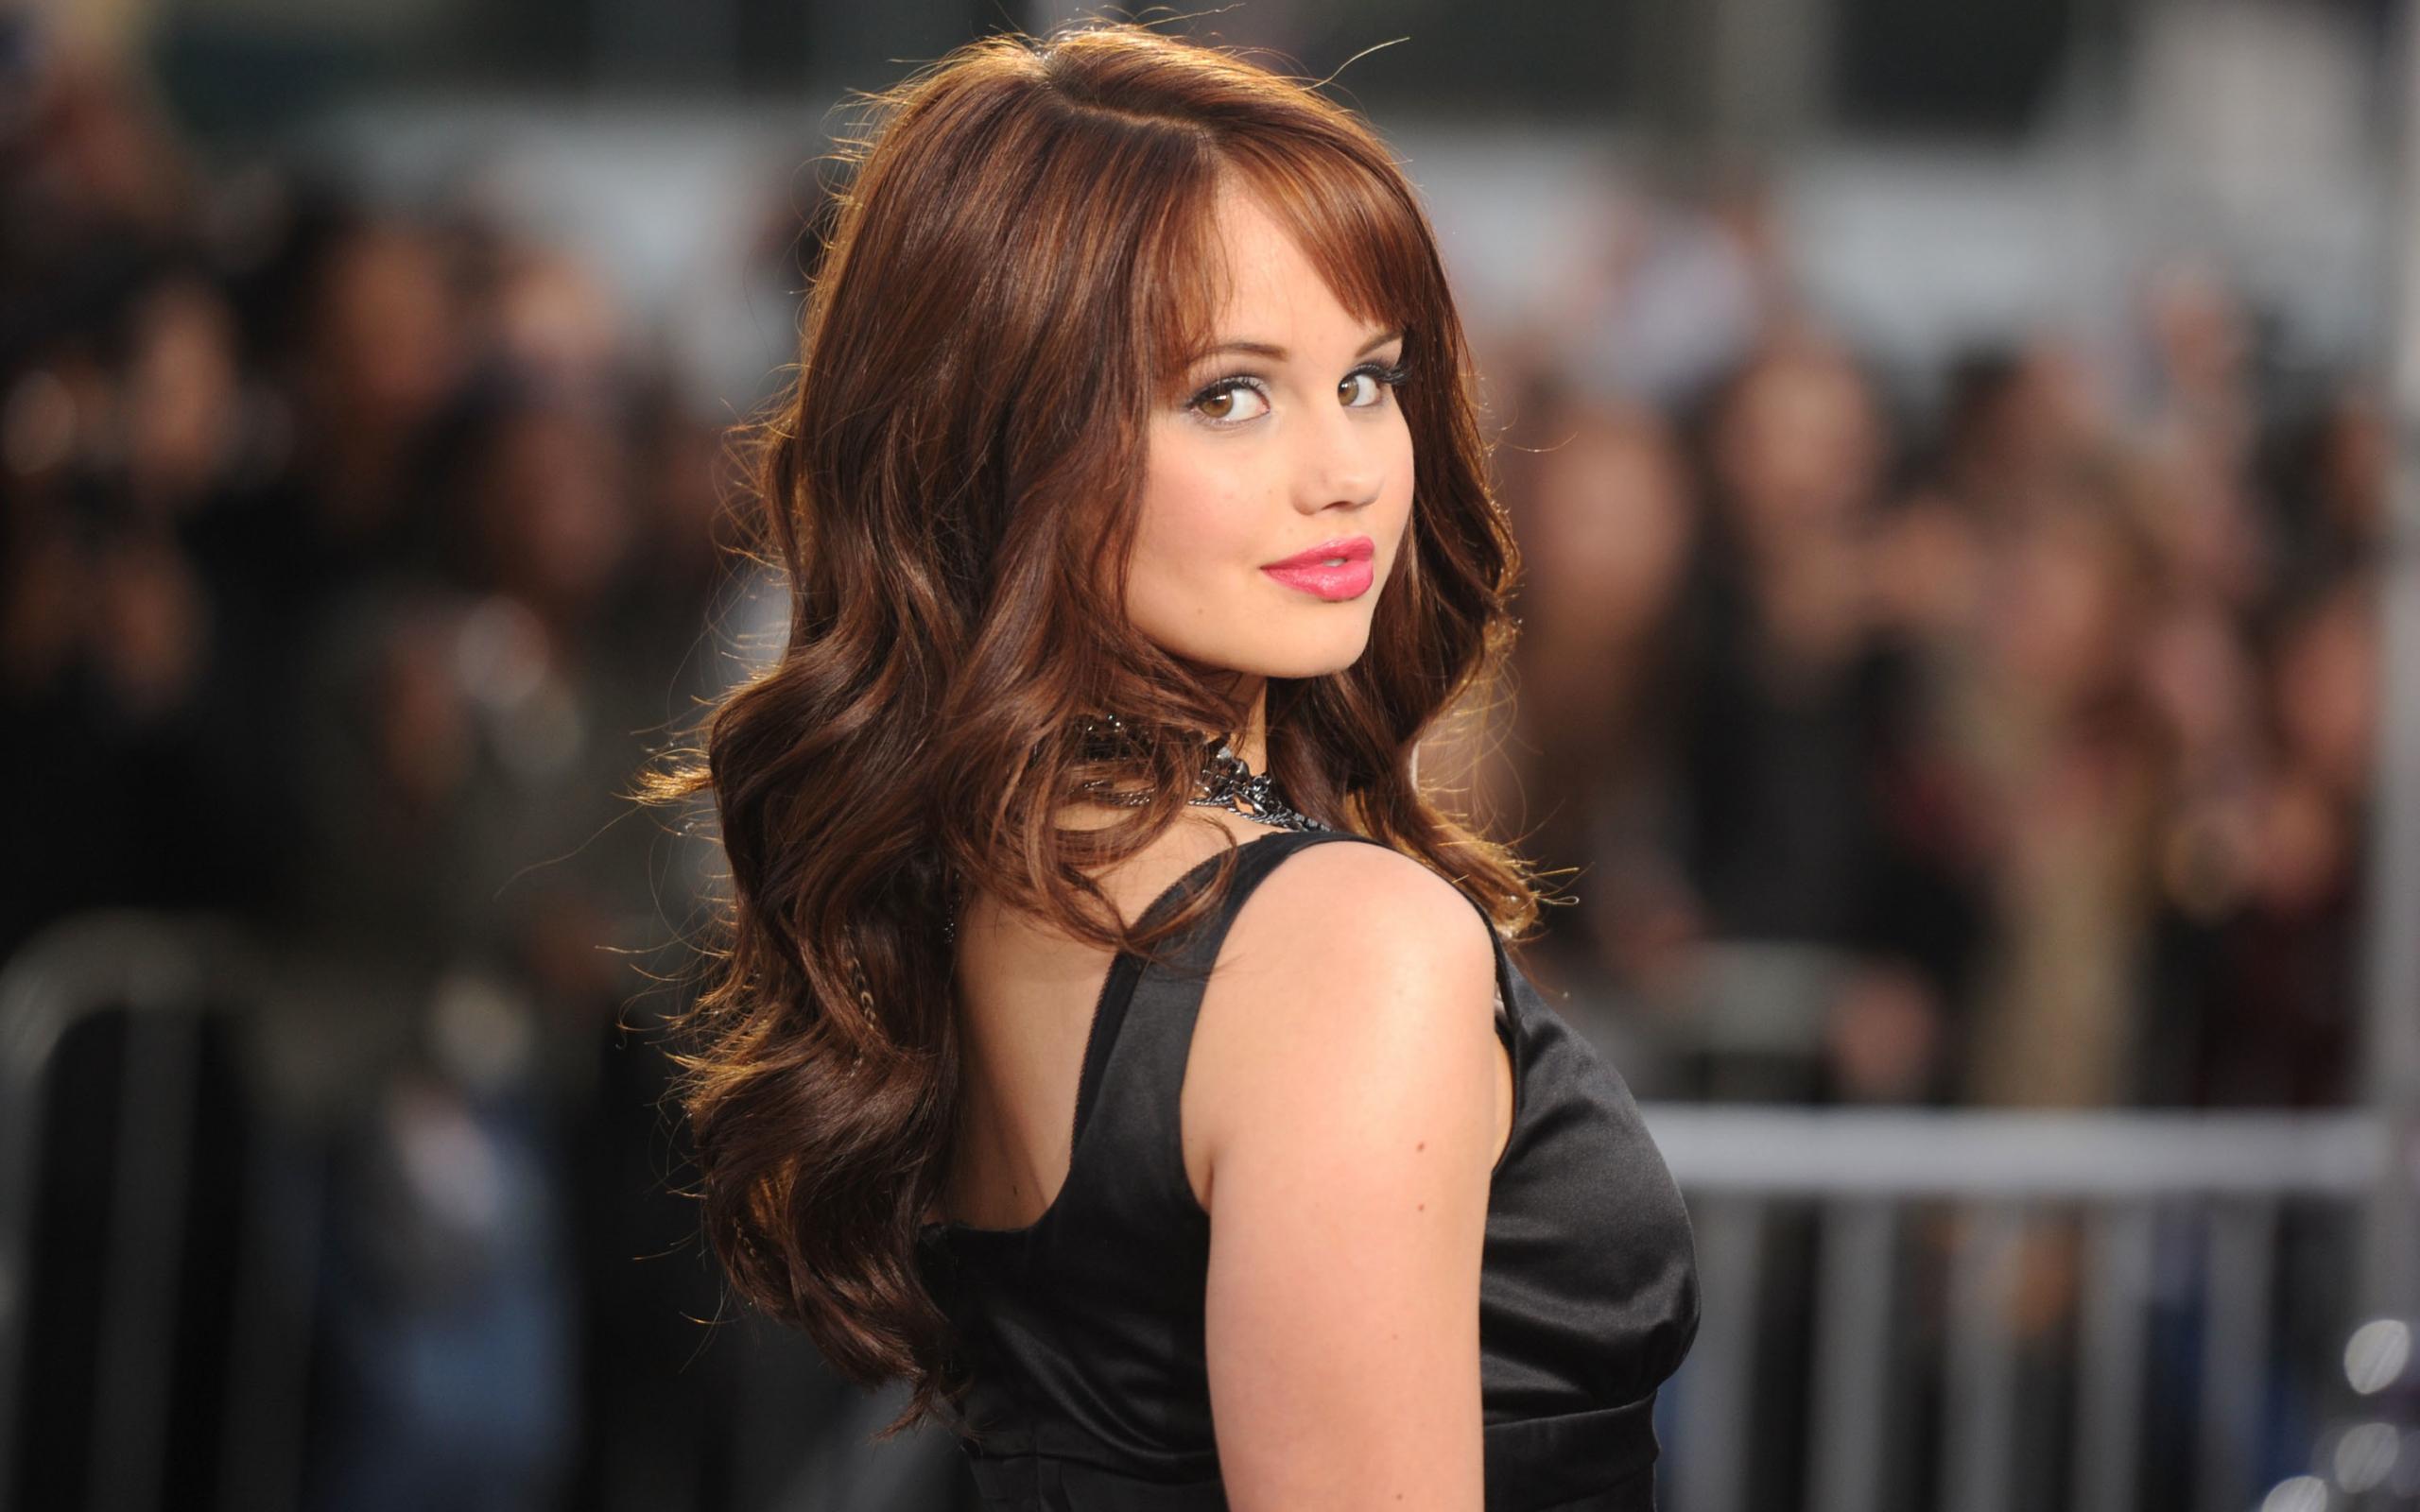 Download 1280x960 Wallpaper Debby Ryan Celebrity Makeup Red Carpet Standard 4 3 Fullscreen 1280x960 Hd Image Background 30500